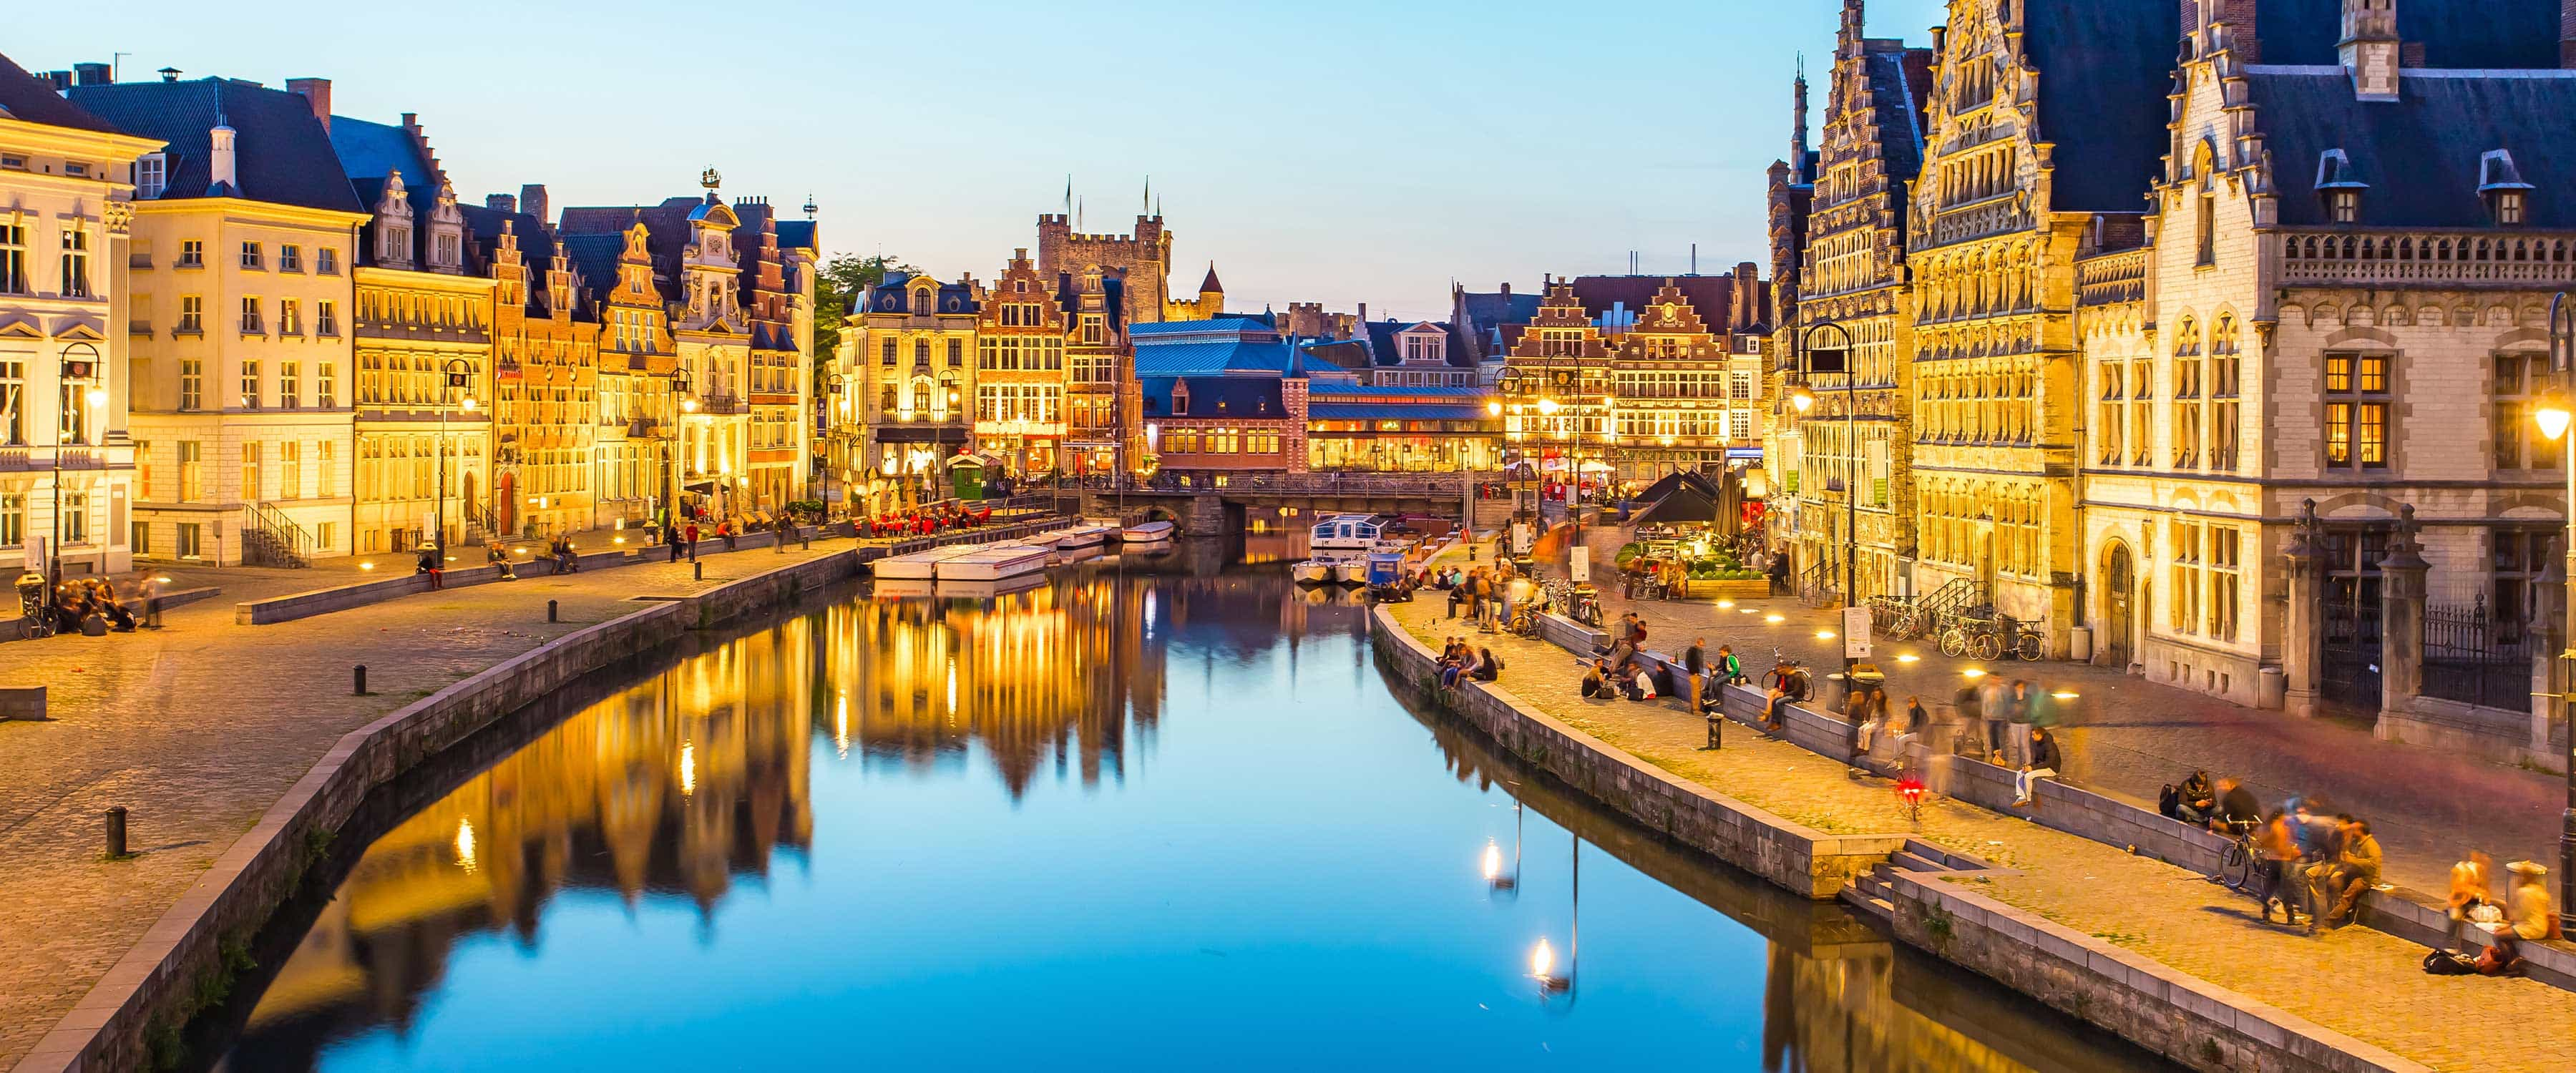 Belgium - French Community Overview | Центр українсько ...